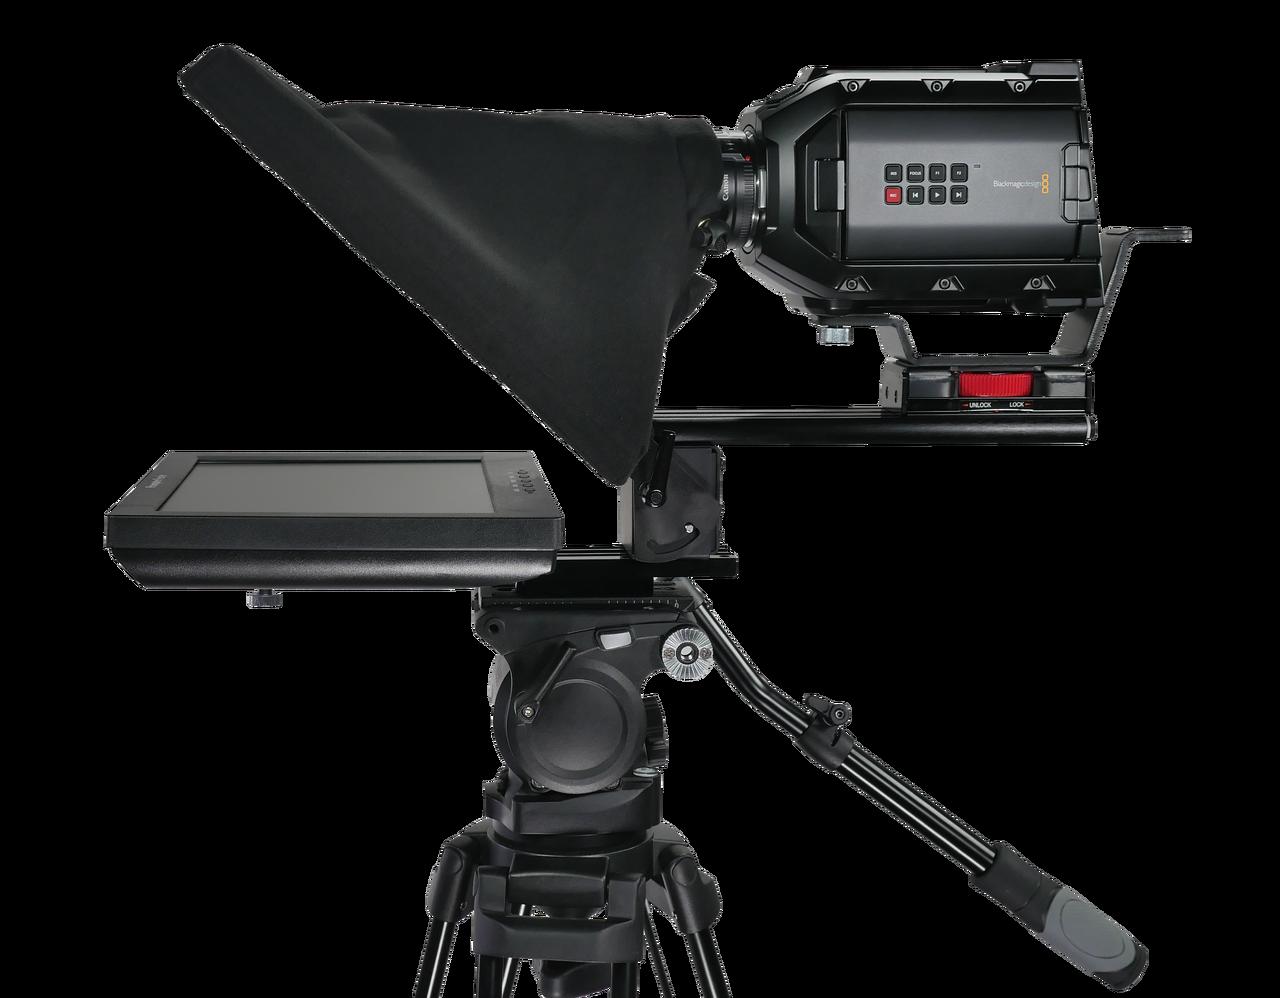 UltraFlex 12 Auto-Reversing Monitor Model - Side